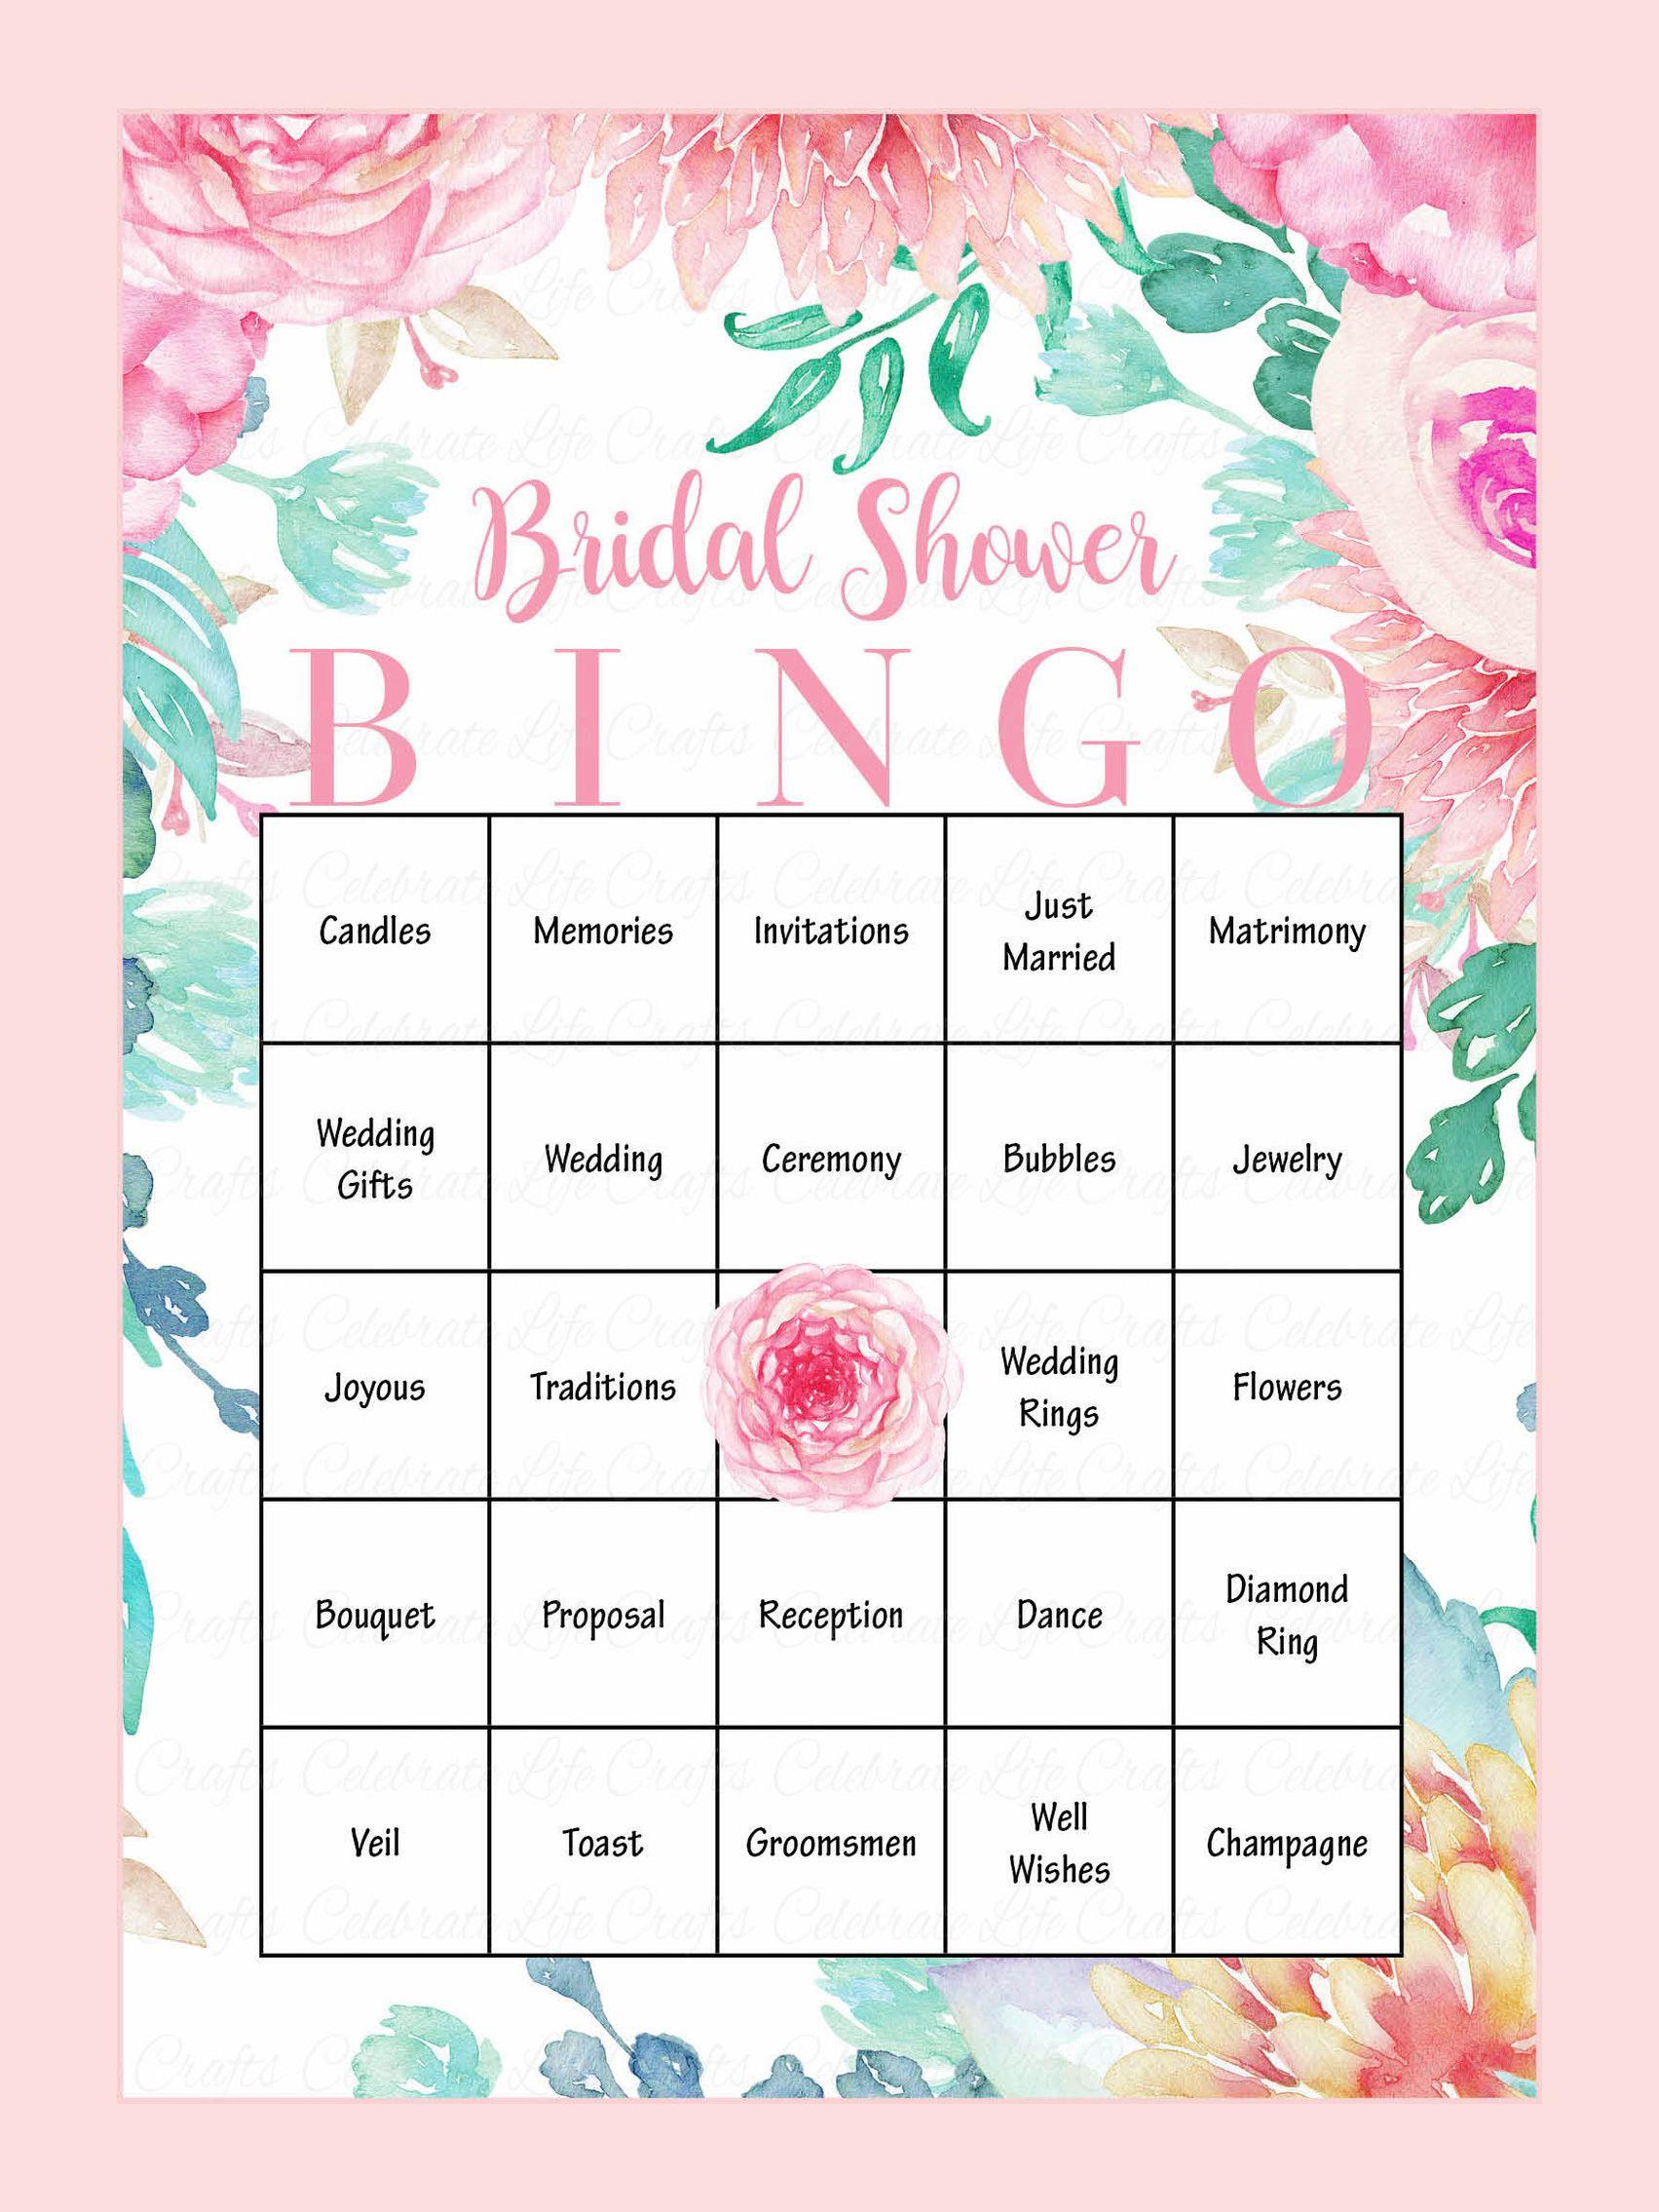 10 Printable Bridal Shower Games You Can Diy | Printable